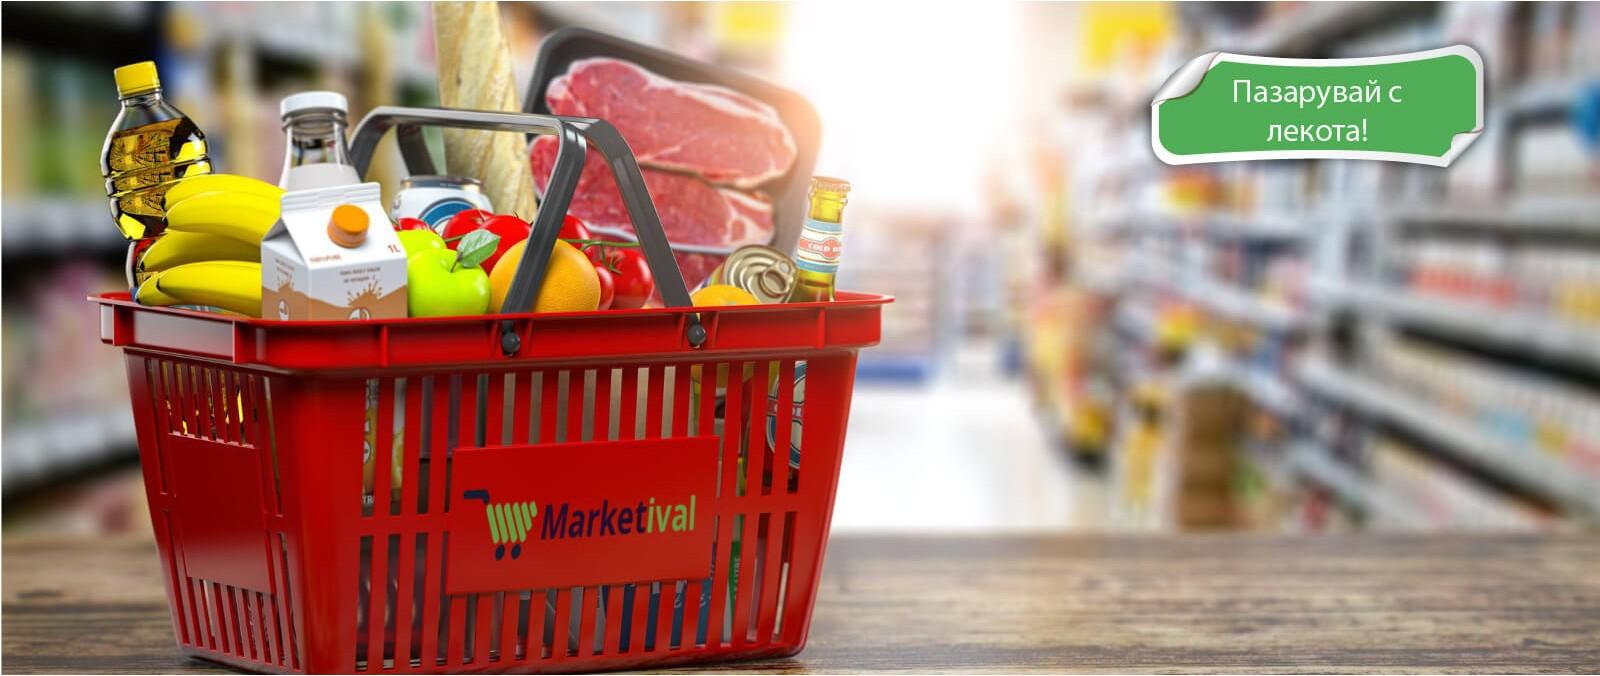 Супермаркет Ival